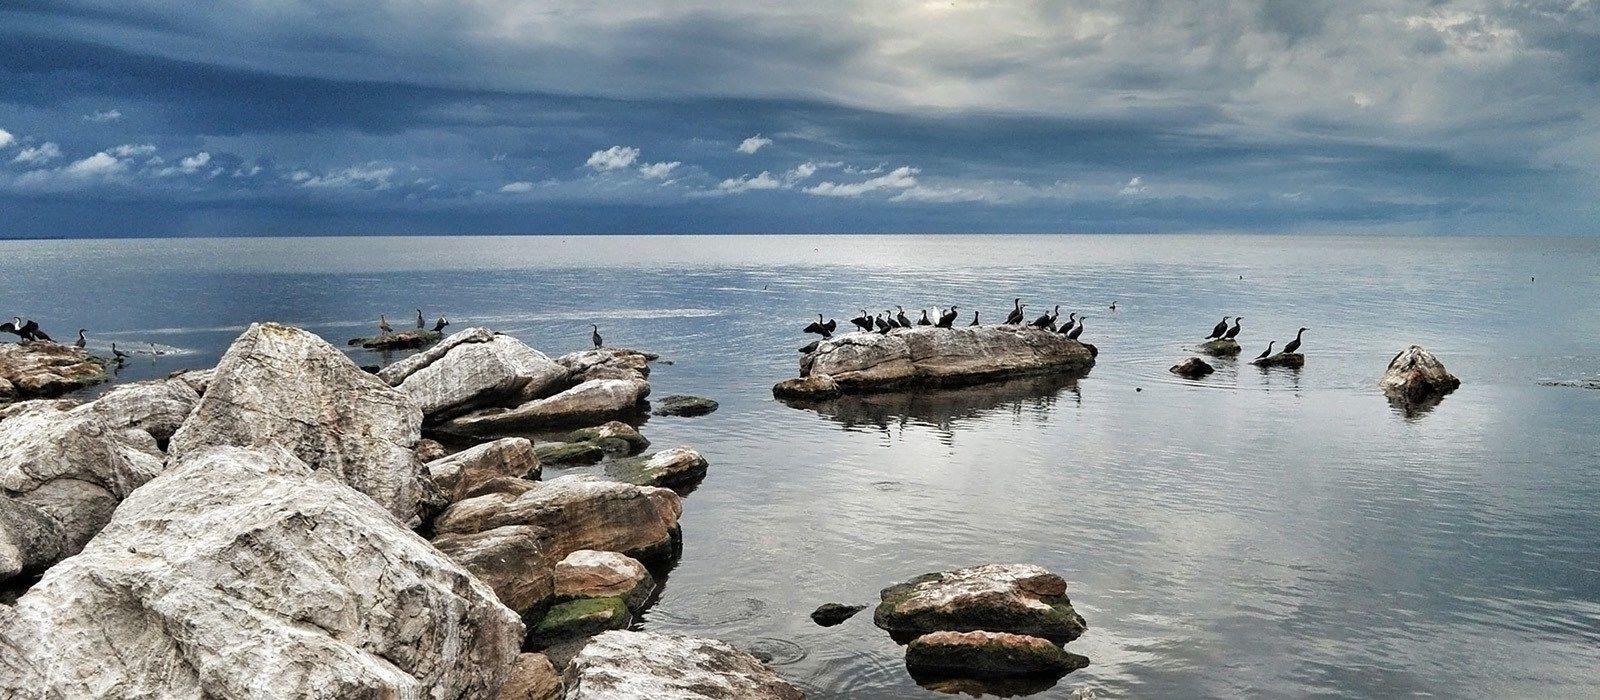 Lakeside Luxury, Wilderness and Wildlife in Tanzania Tour Trip 1